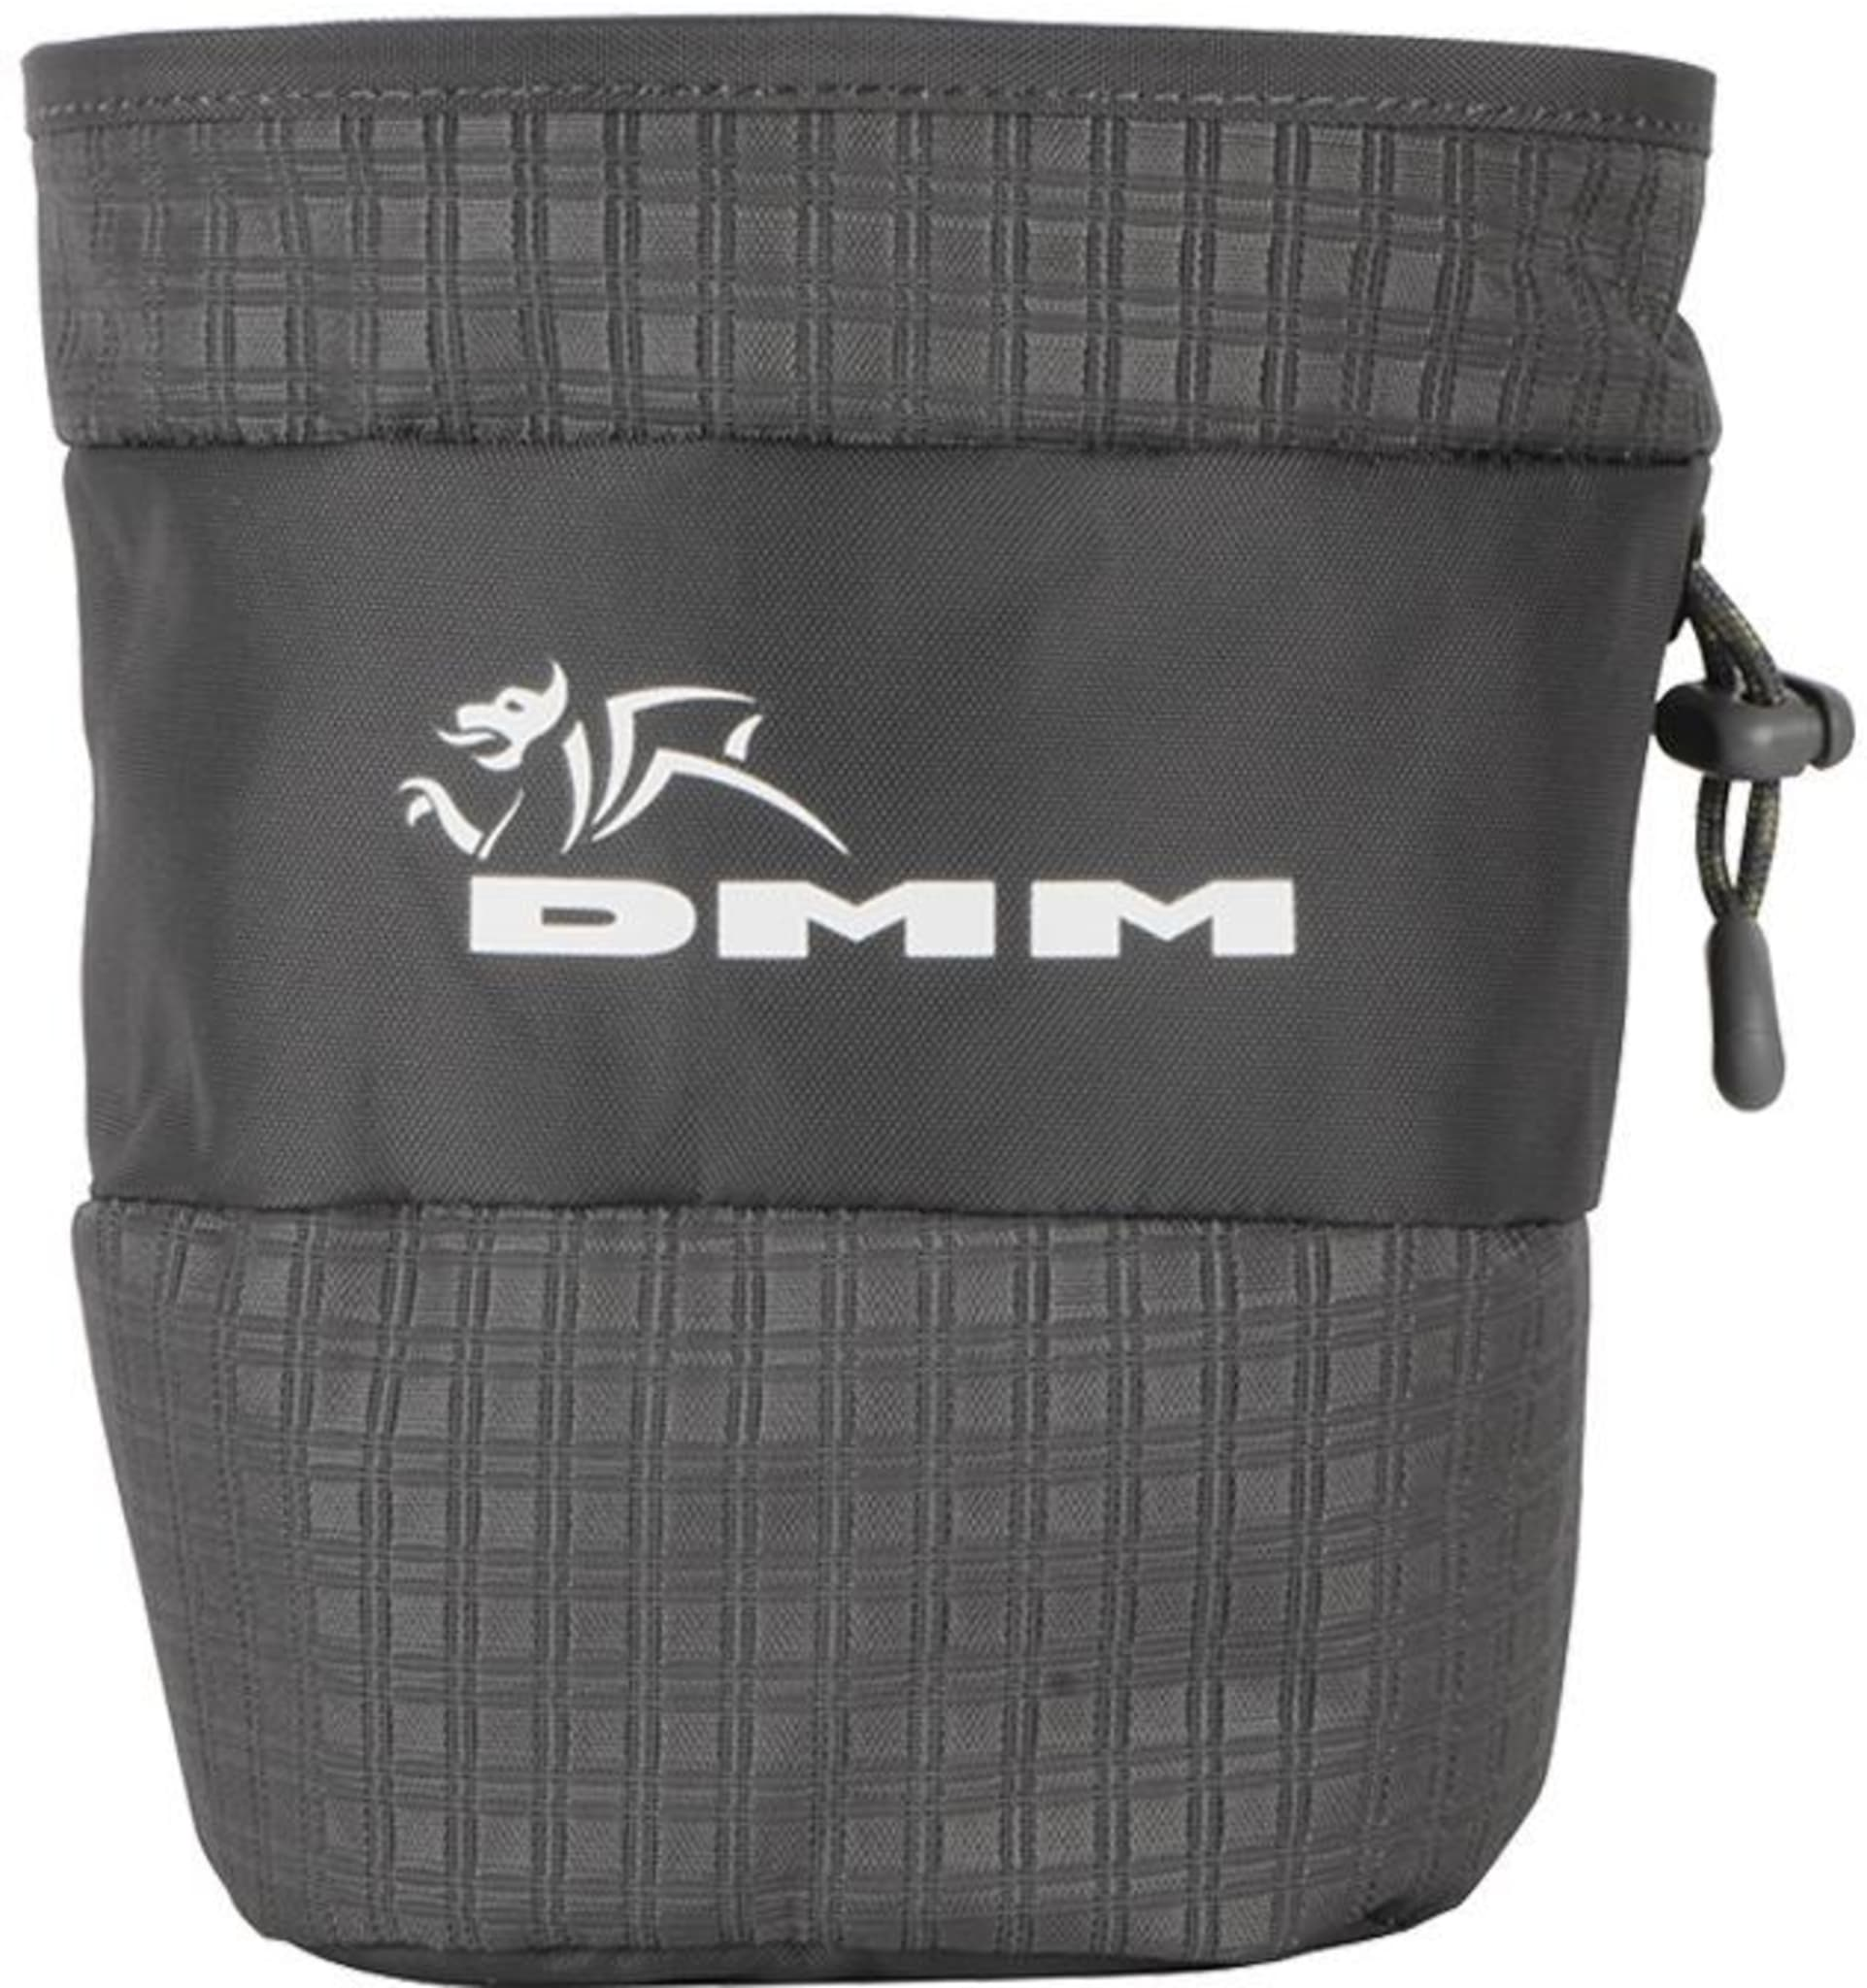 Enkel og effektiv kalkpose med god plass.